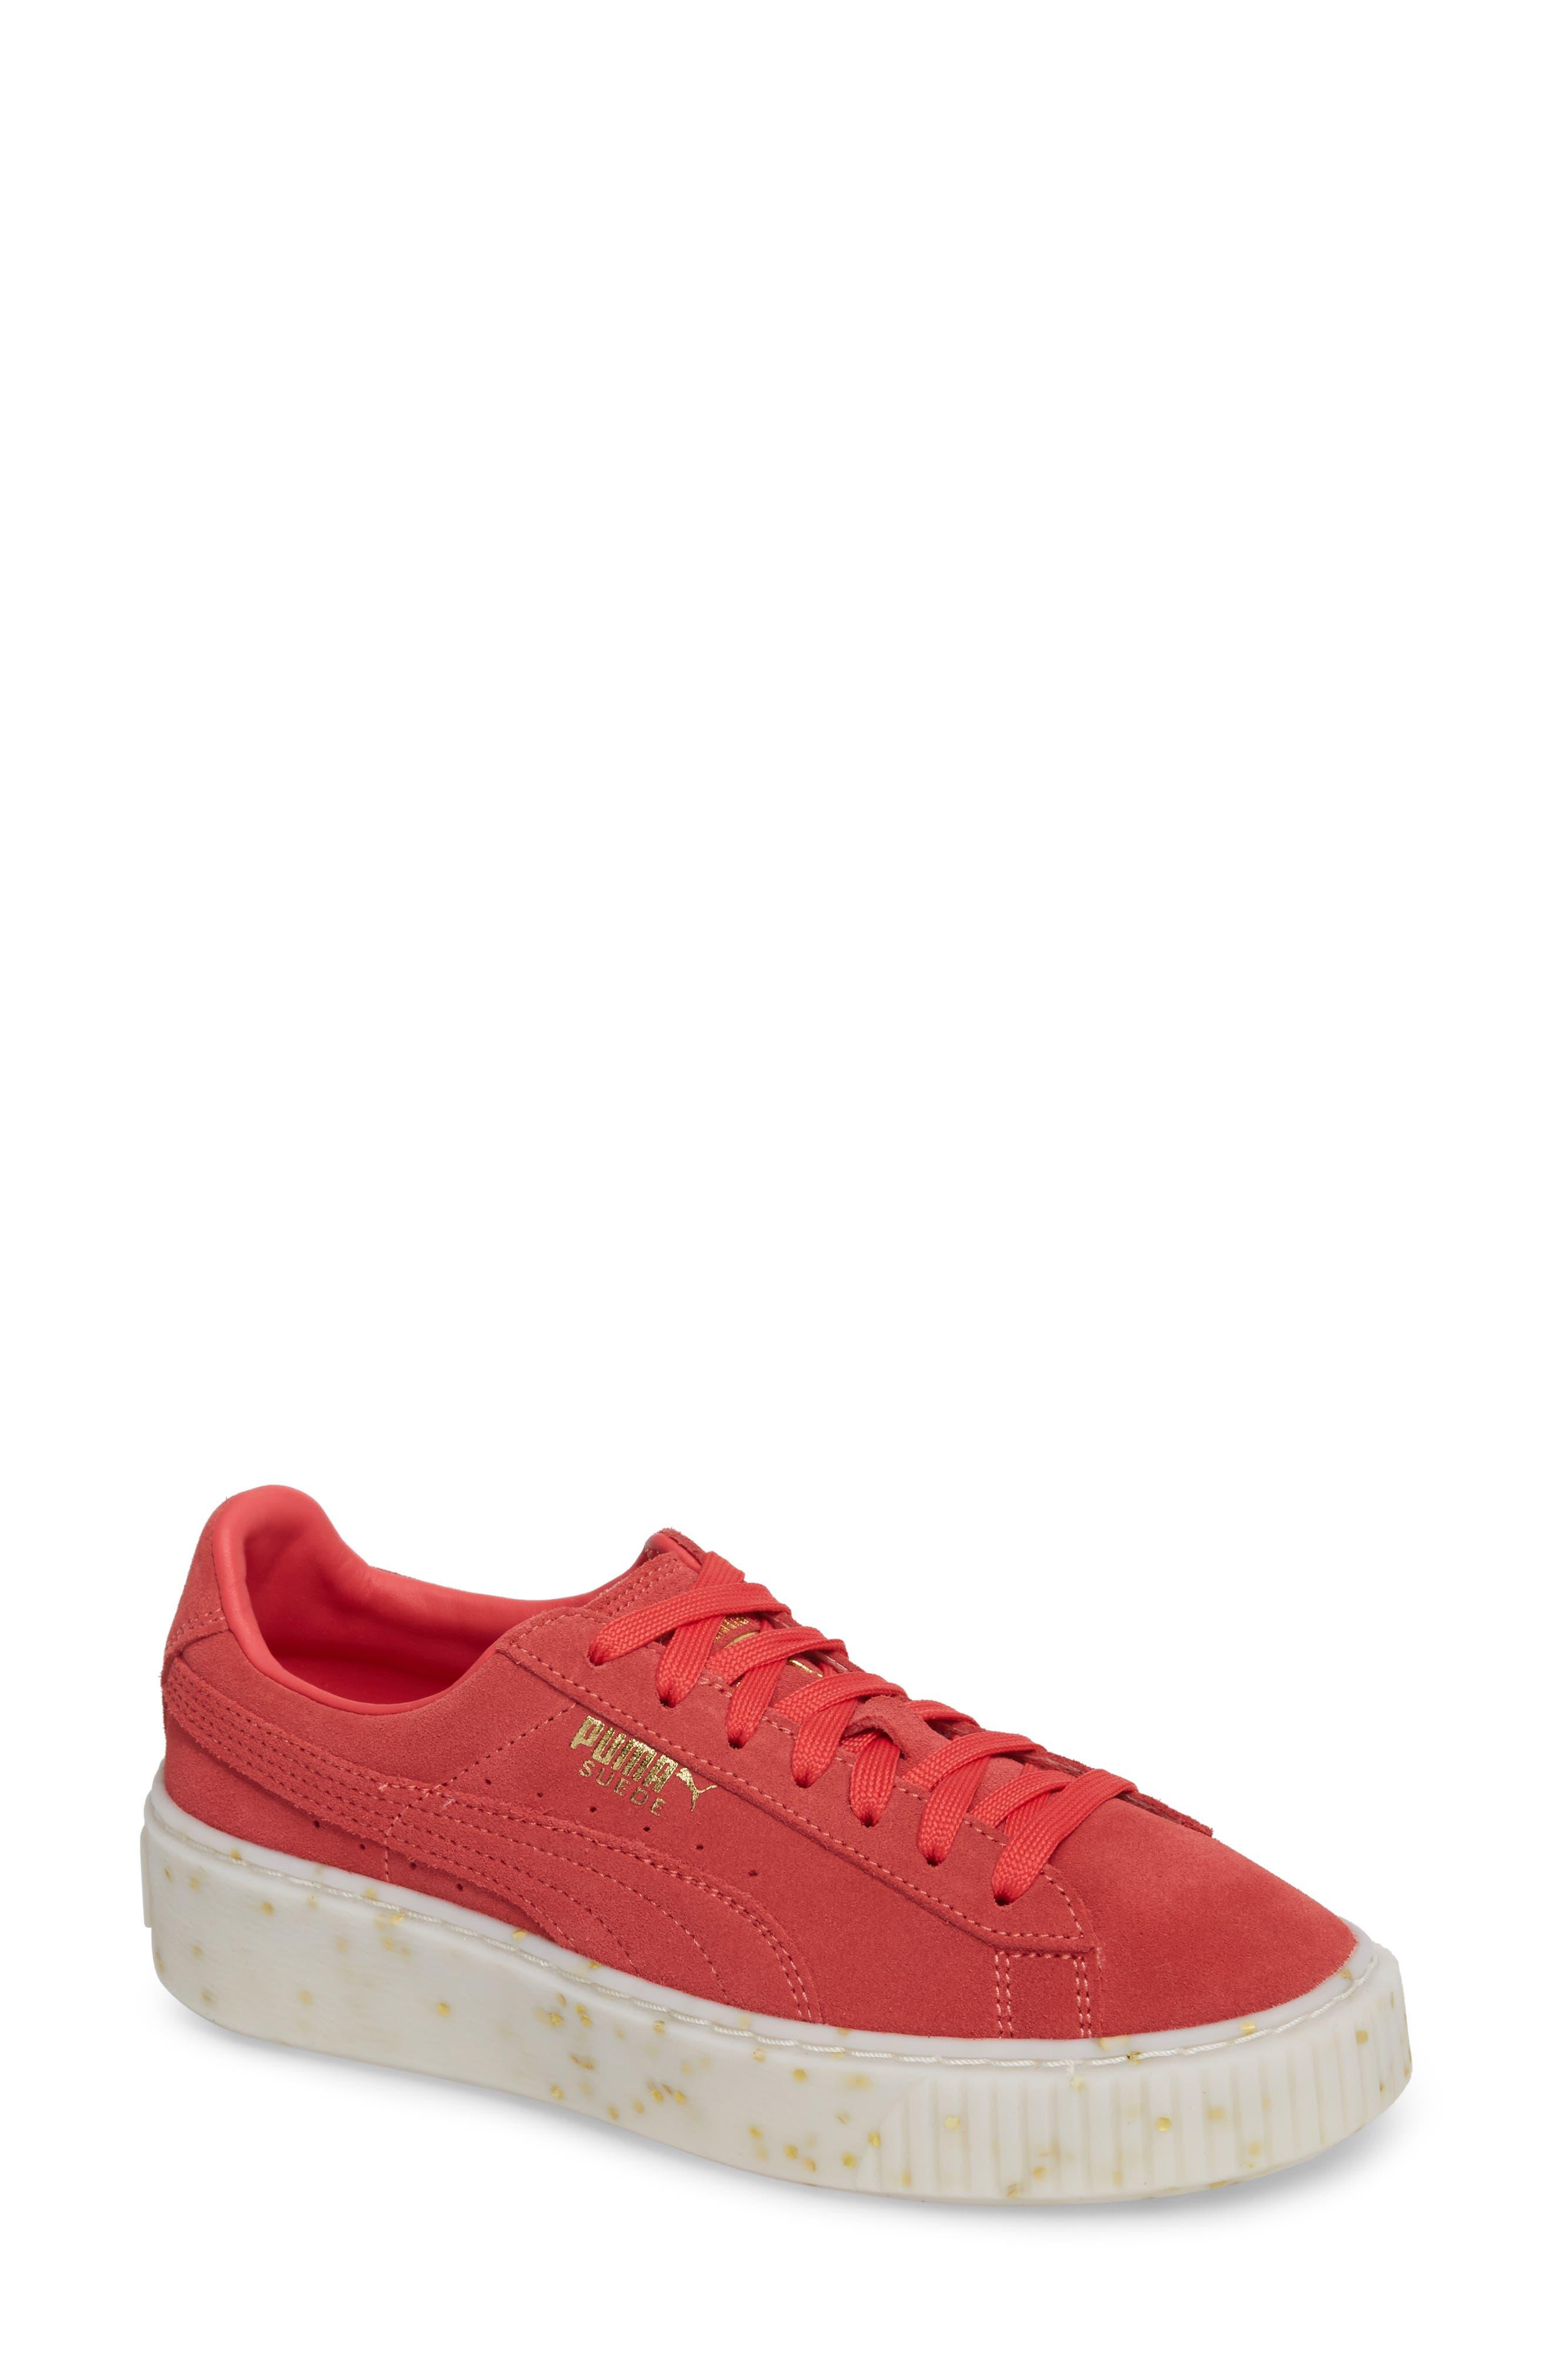 Suede Platform Sneaker,                             Main thumbnail 1, color,                             Paradise Pink/ Team Gold